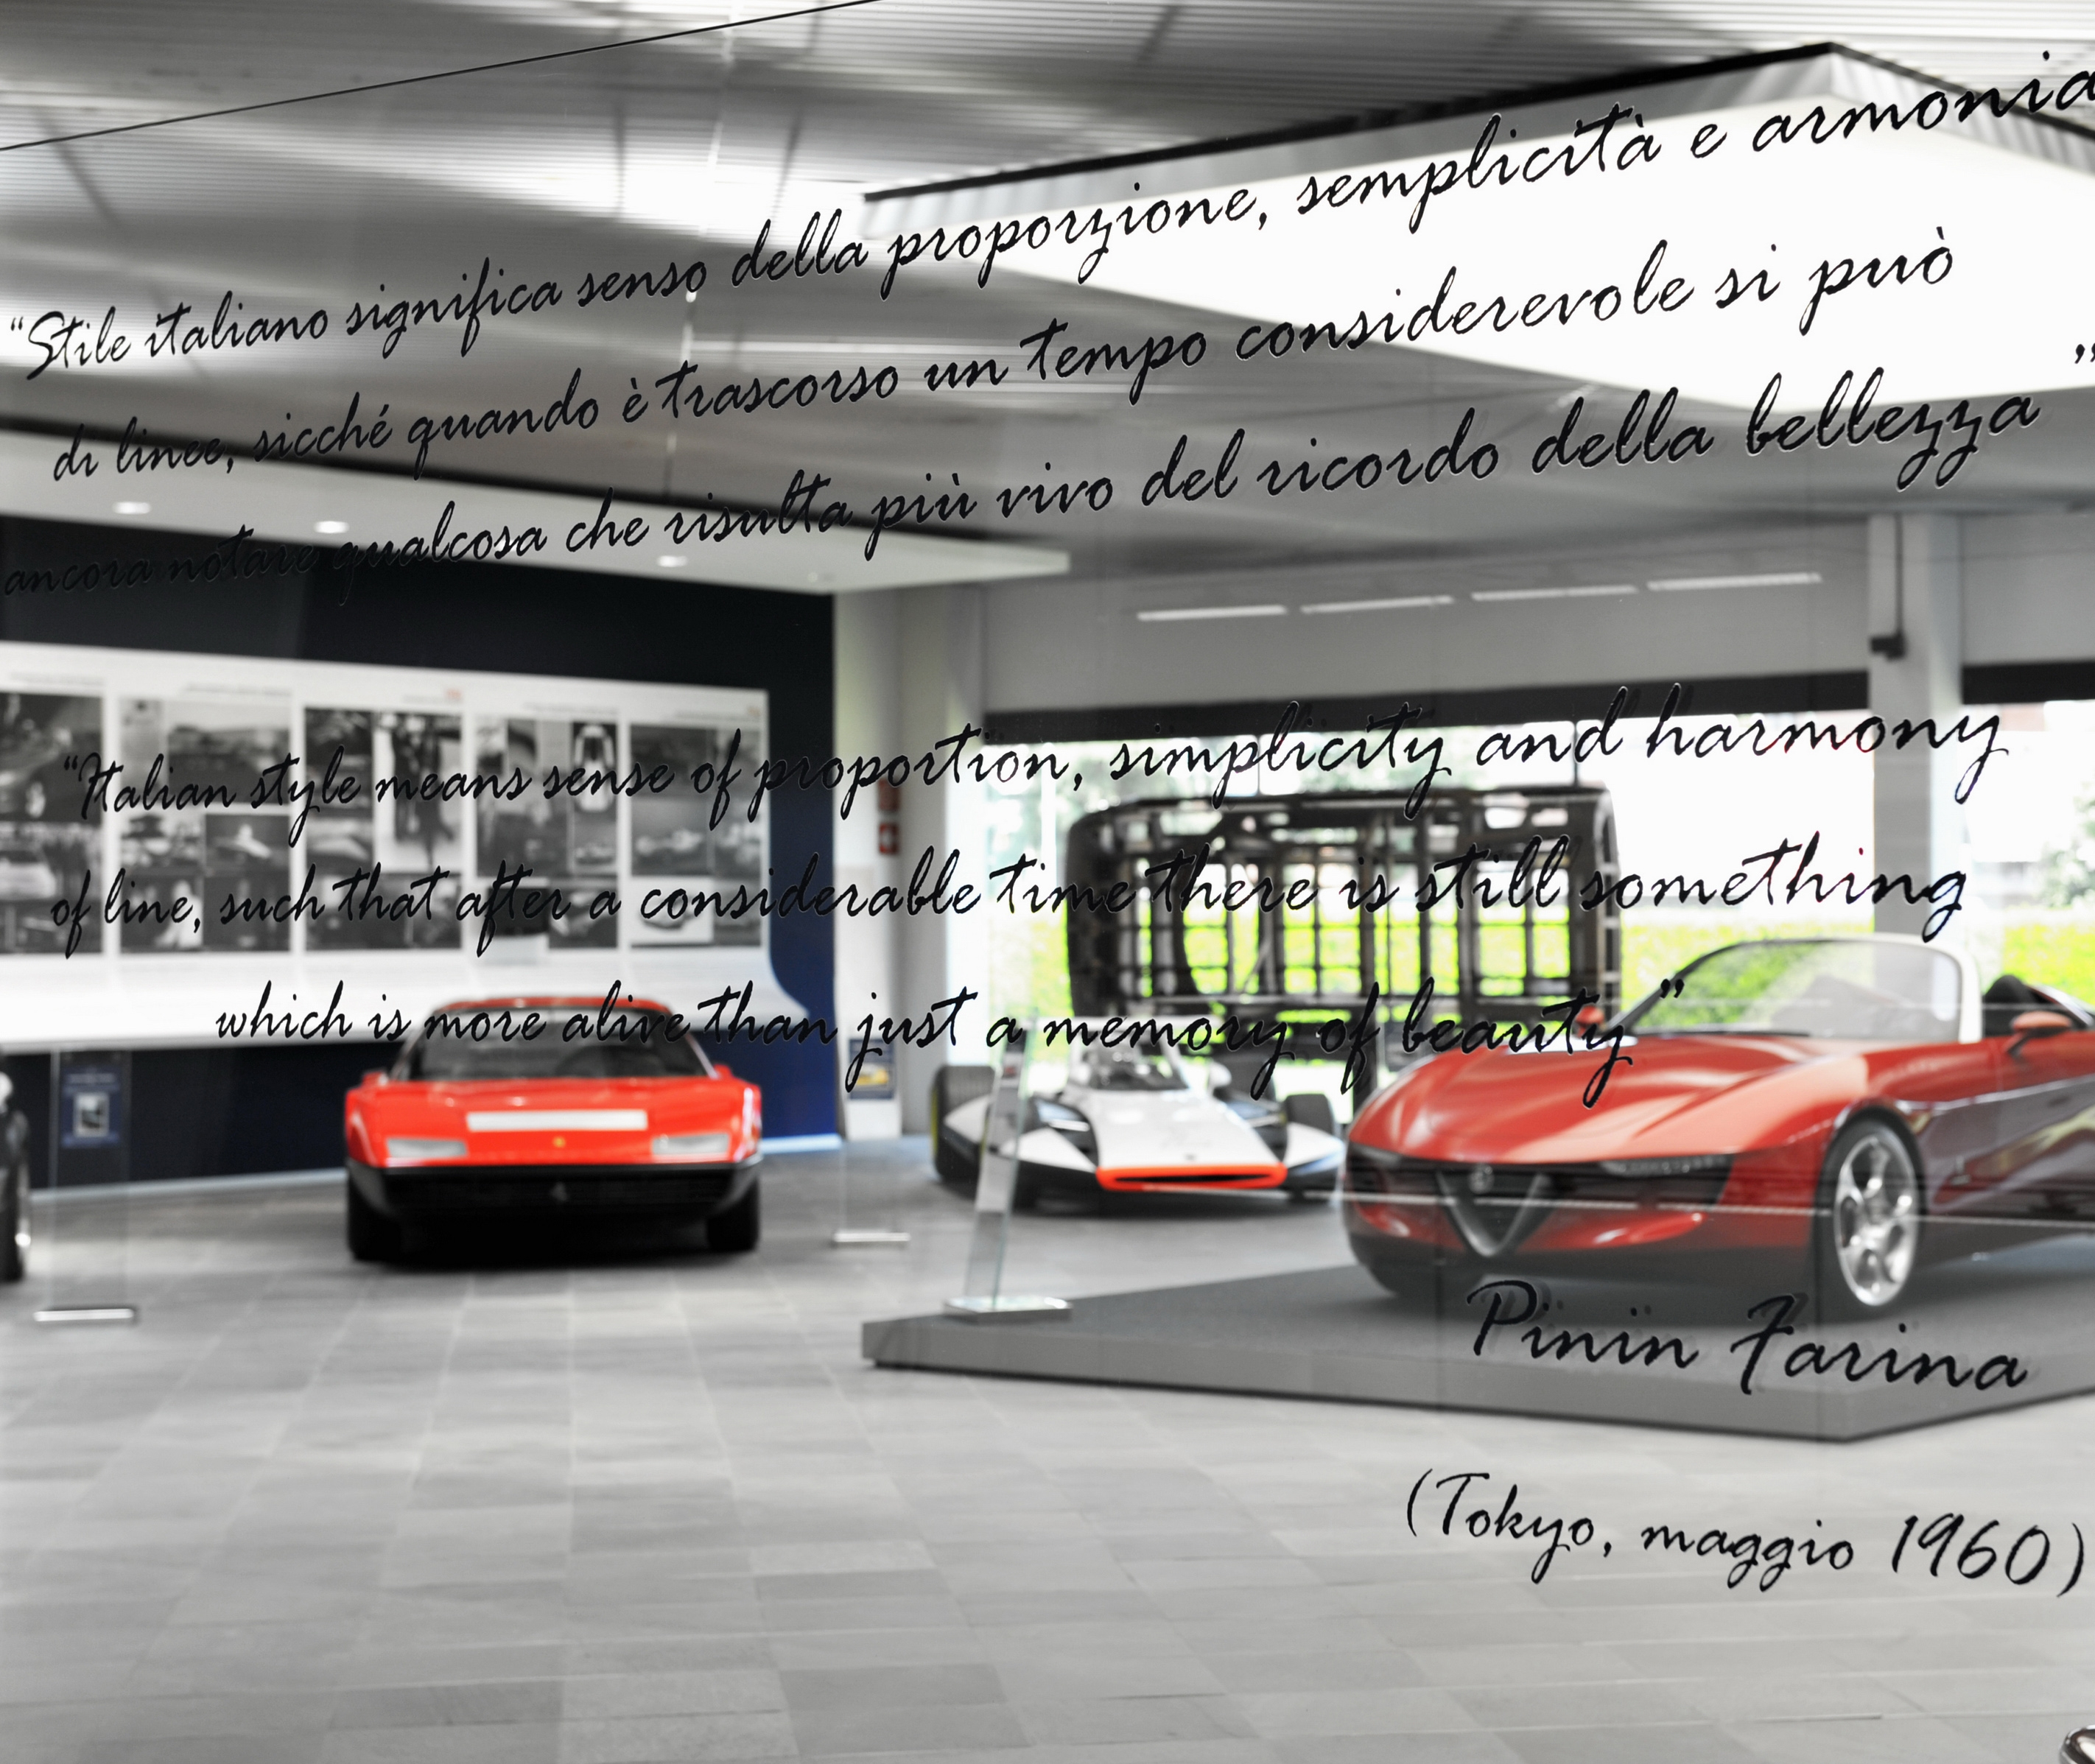 Pininfarina automotive SAP